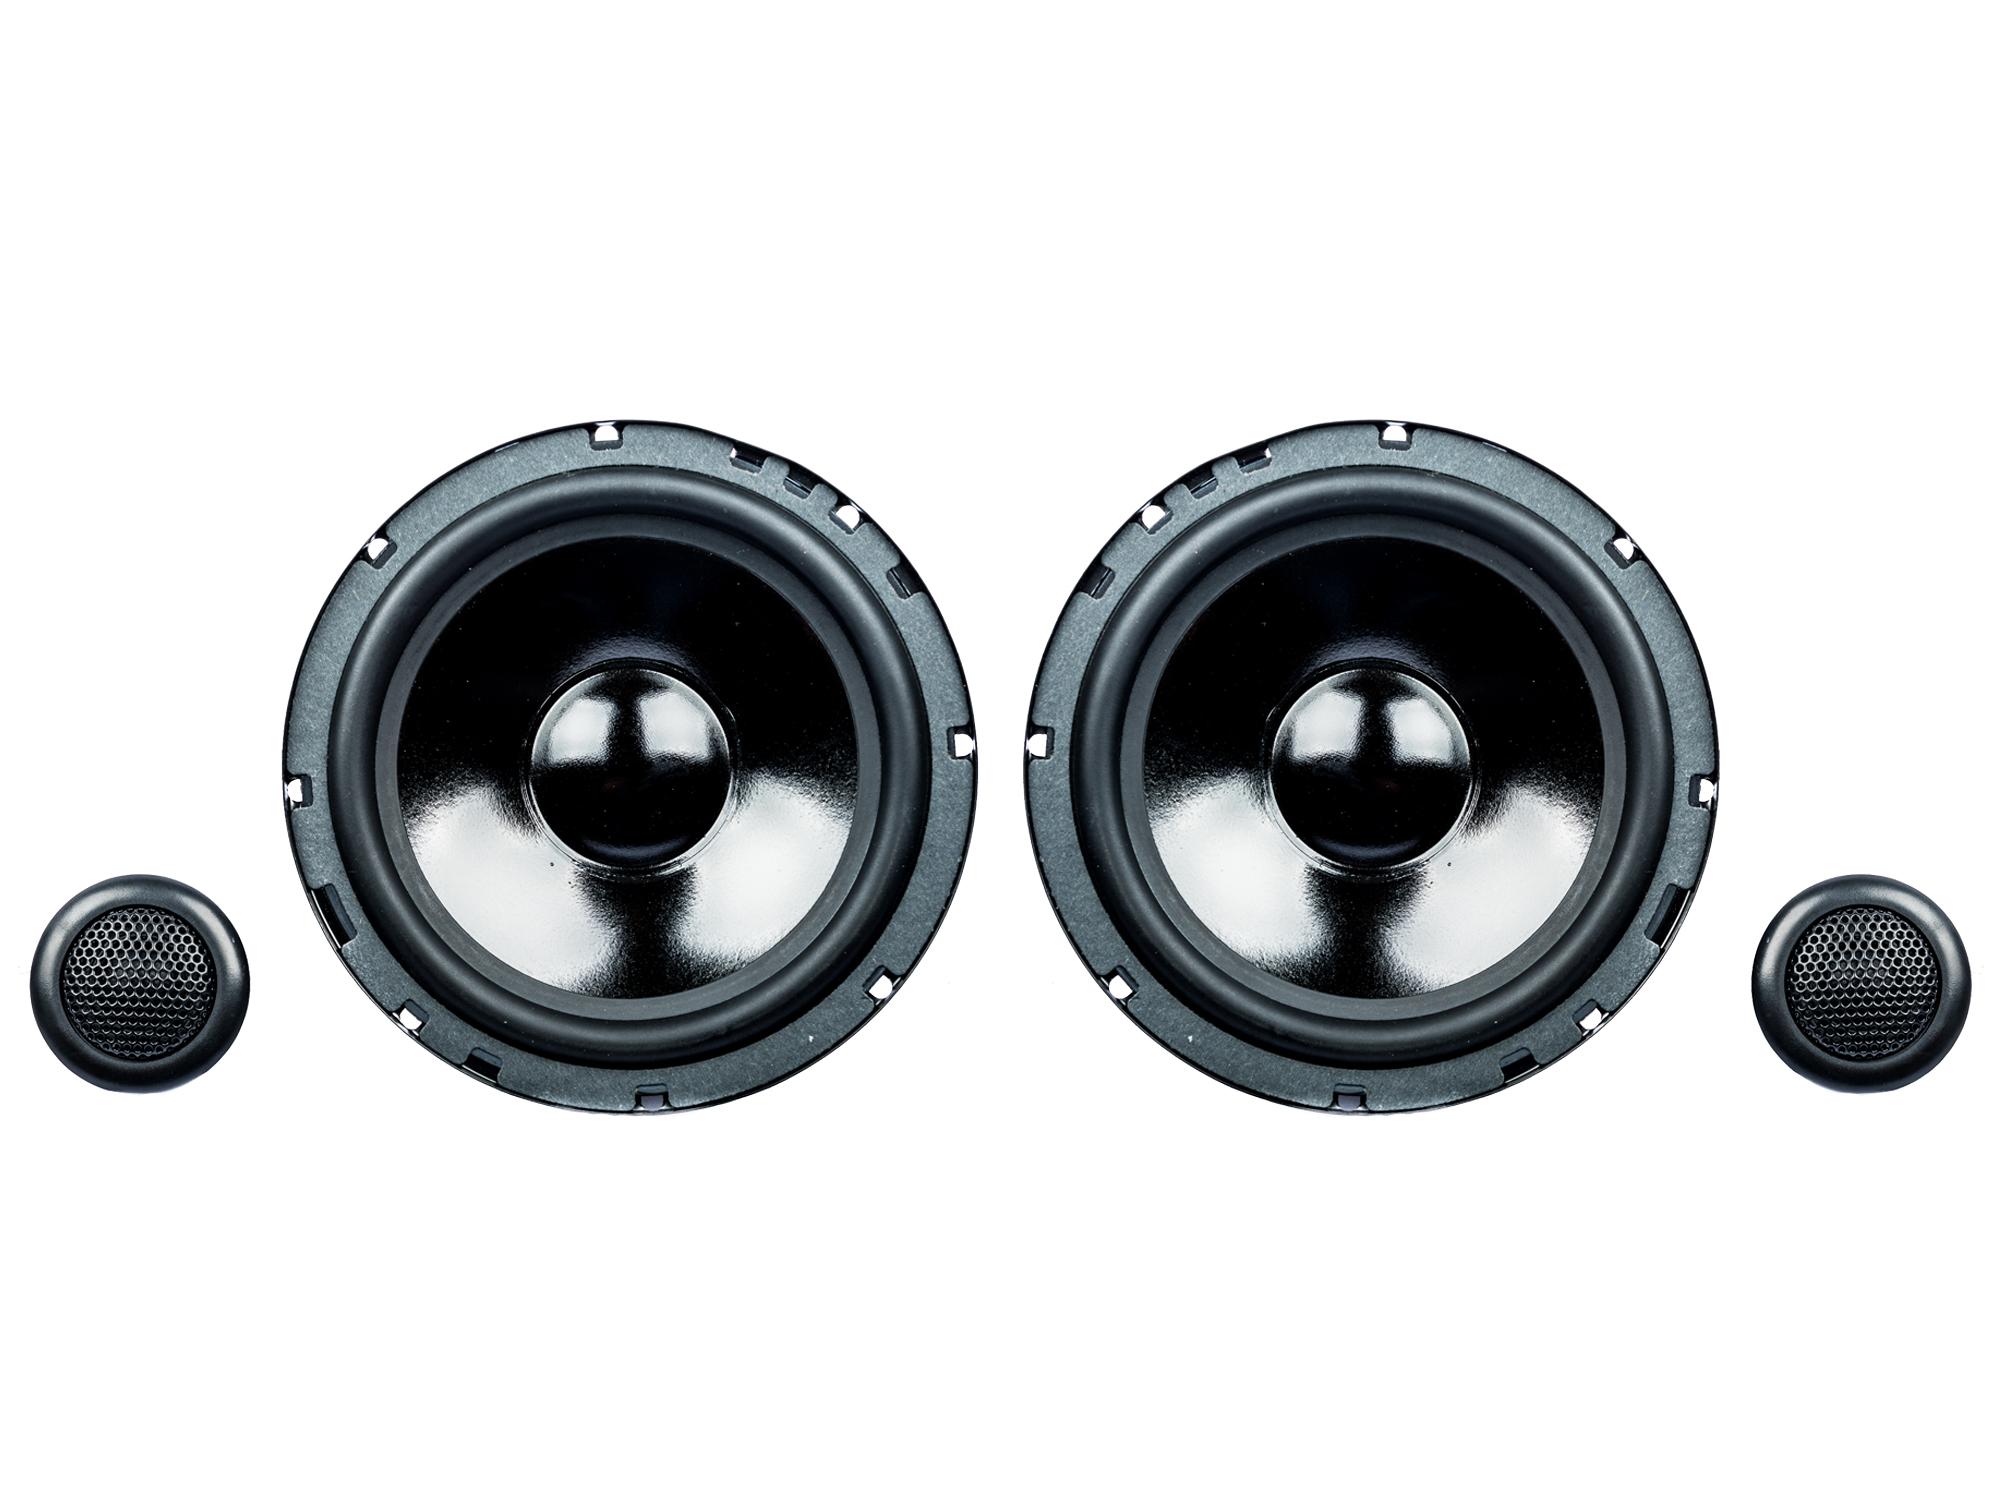 VW Golf 7, VW Polo 9N, VW Up, Lautsprecher, Boxen, Tür vorne, PG Audio Evo II 2.16